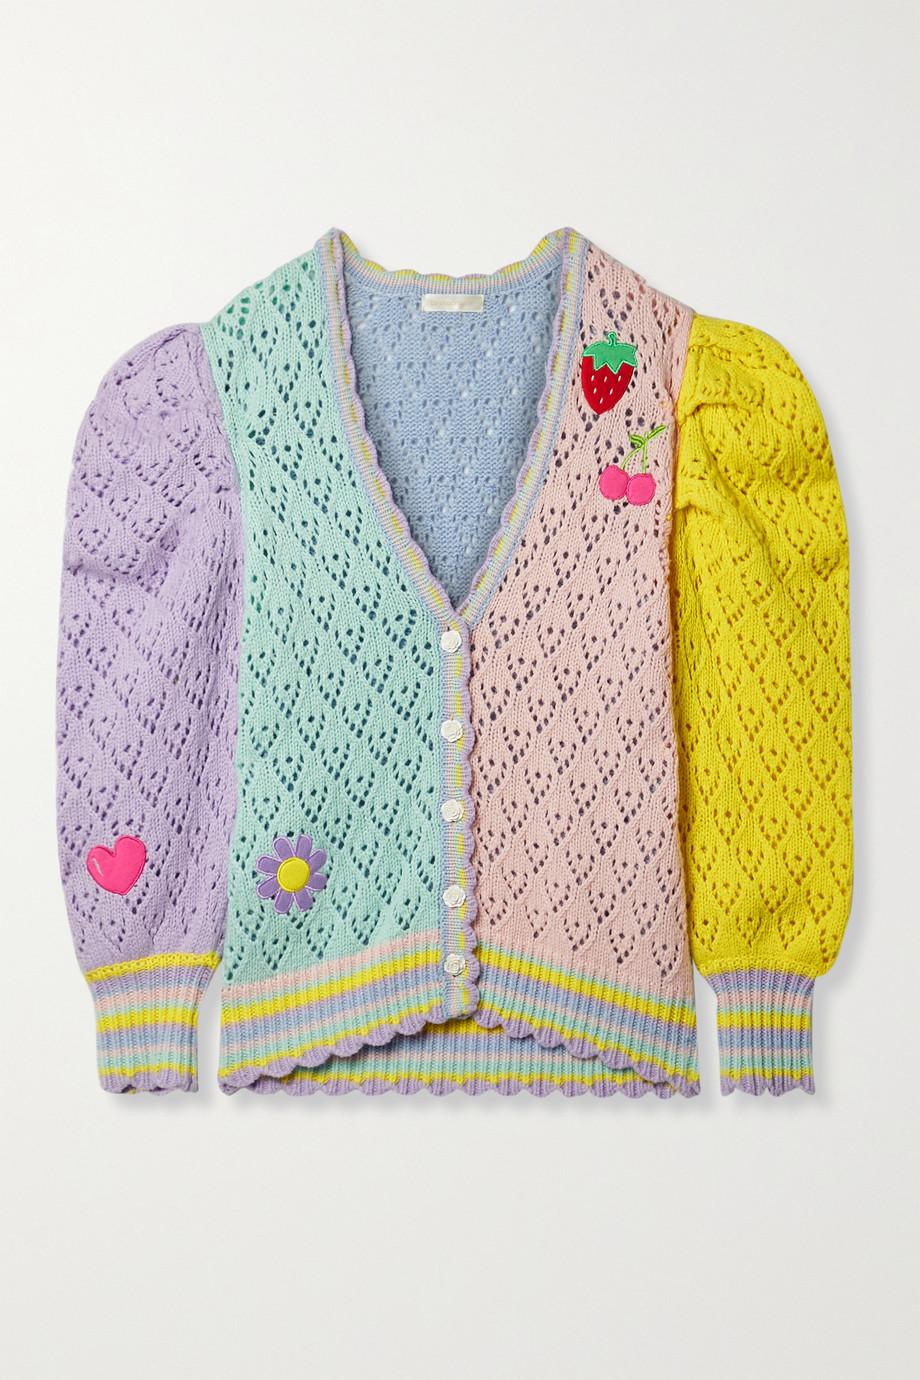 LoveShackFancy Brody Oversized-Cardigan aus Lochstrick mit Applikationen in Colour-Block-Optik